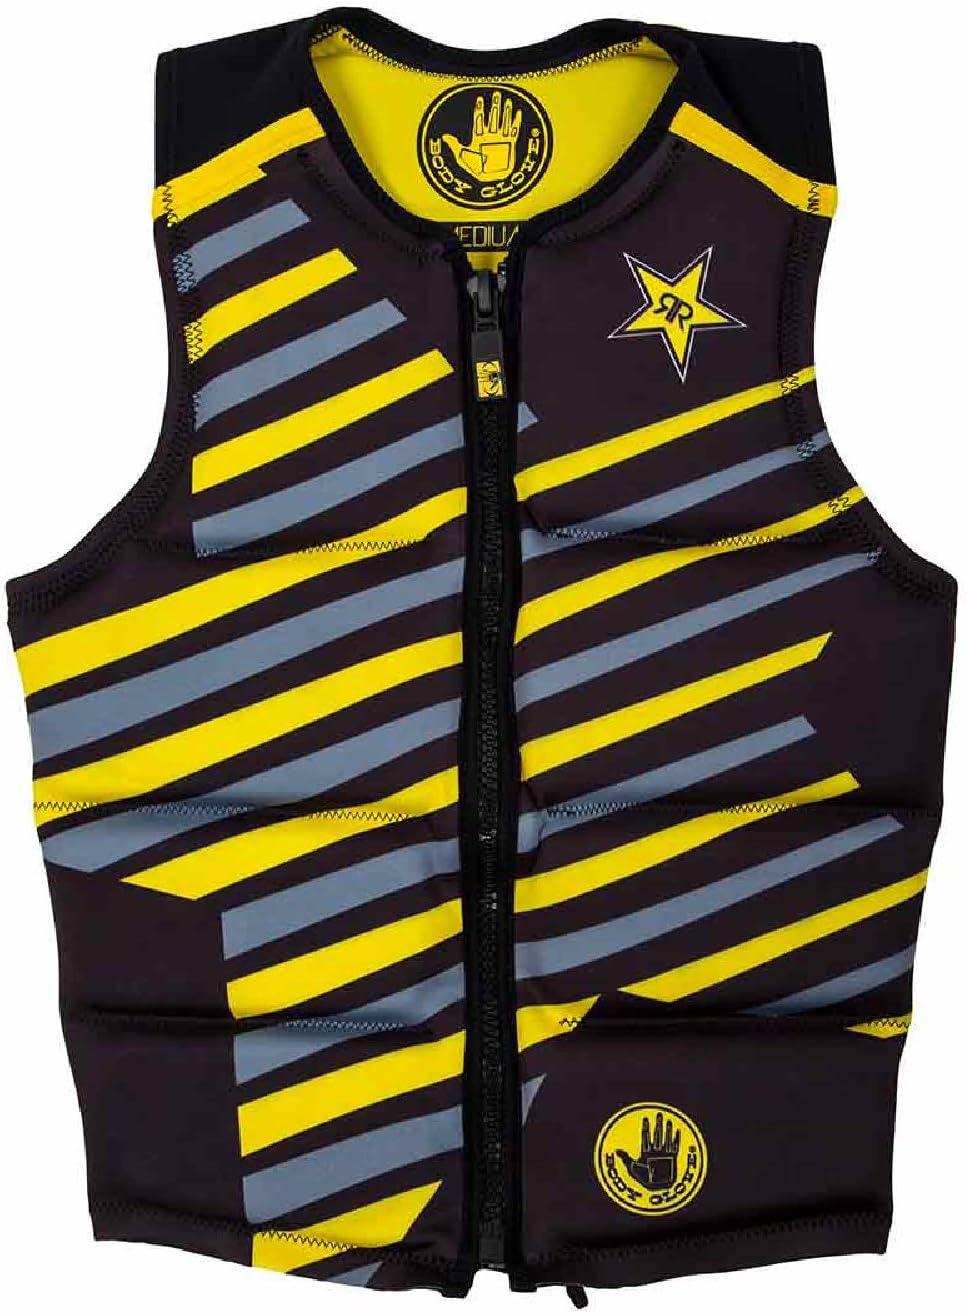 Comp Vest Black Body Glove 2019 Rockstar